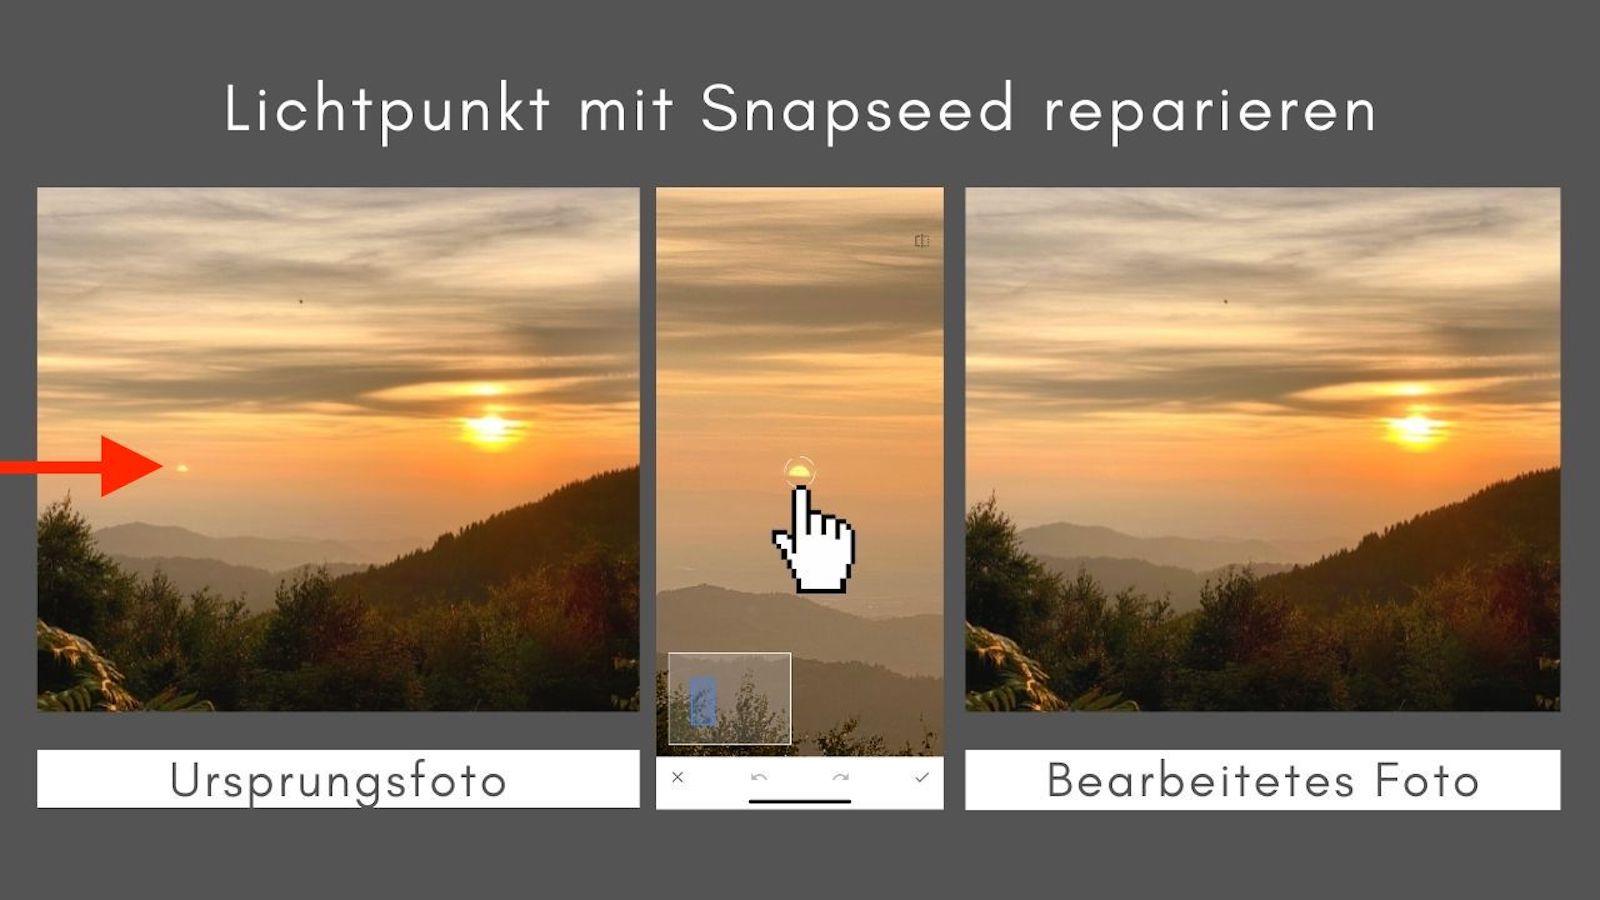 Lichtpunkt reparieren Snapseed App